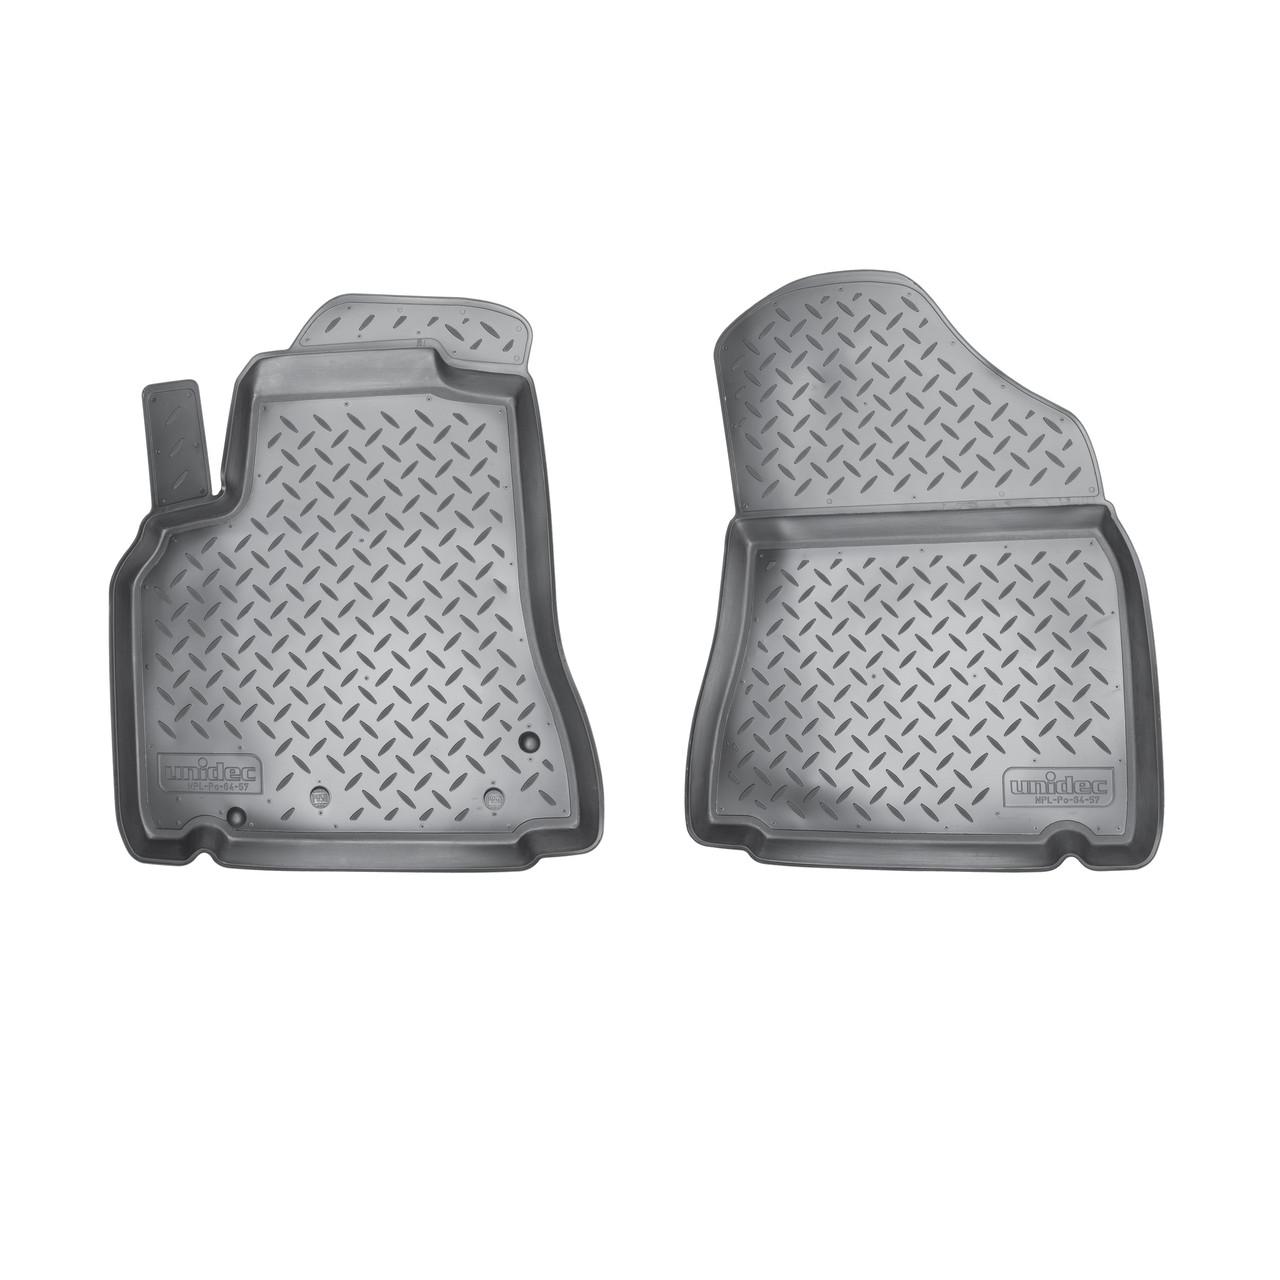 Коврики в салон Peugeot Partner Tepee (B9) (2008) (пер)\ Citroen Berlingo (B9) (2008) (пер)